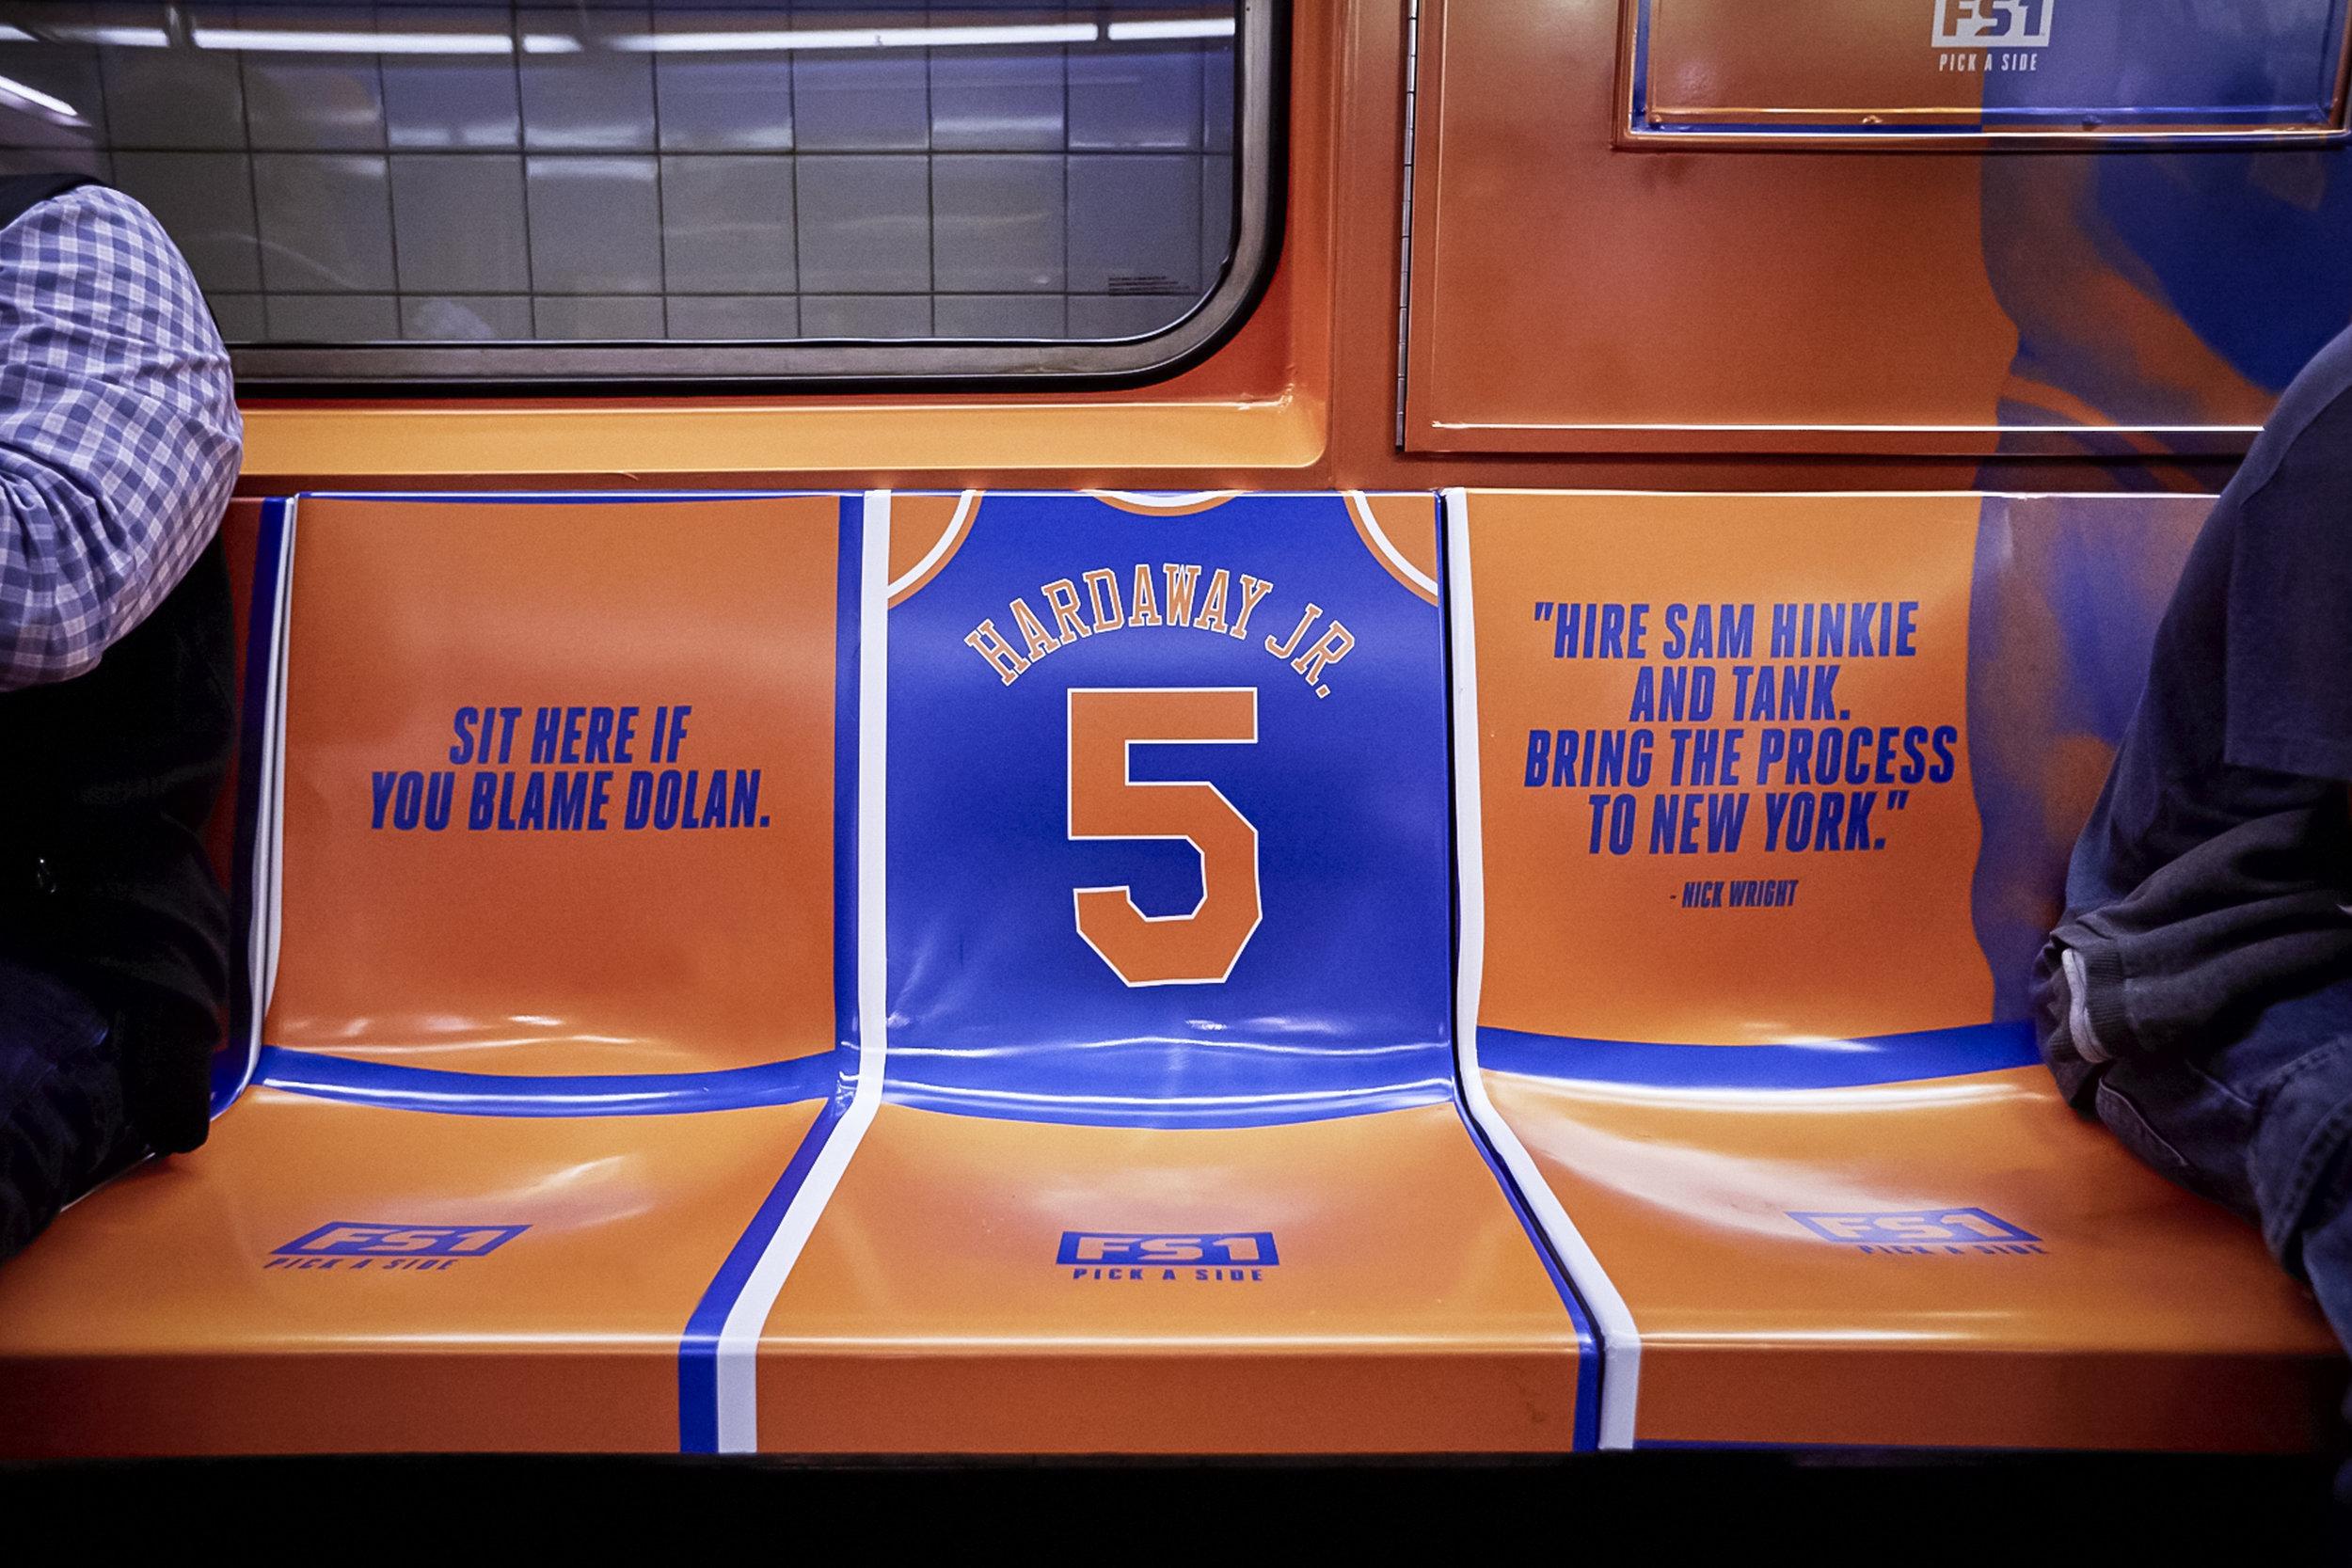 FS1_subway_shots_06.jpg